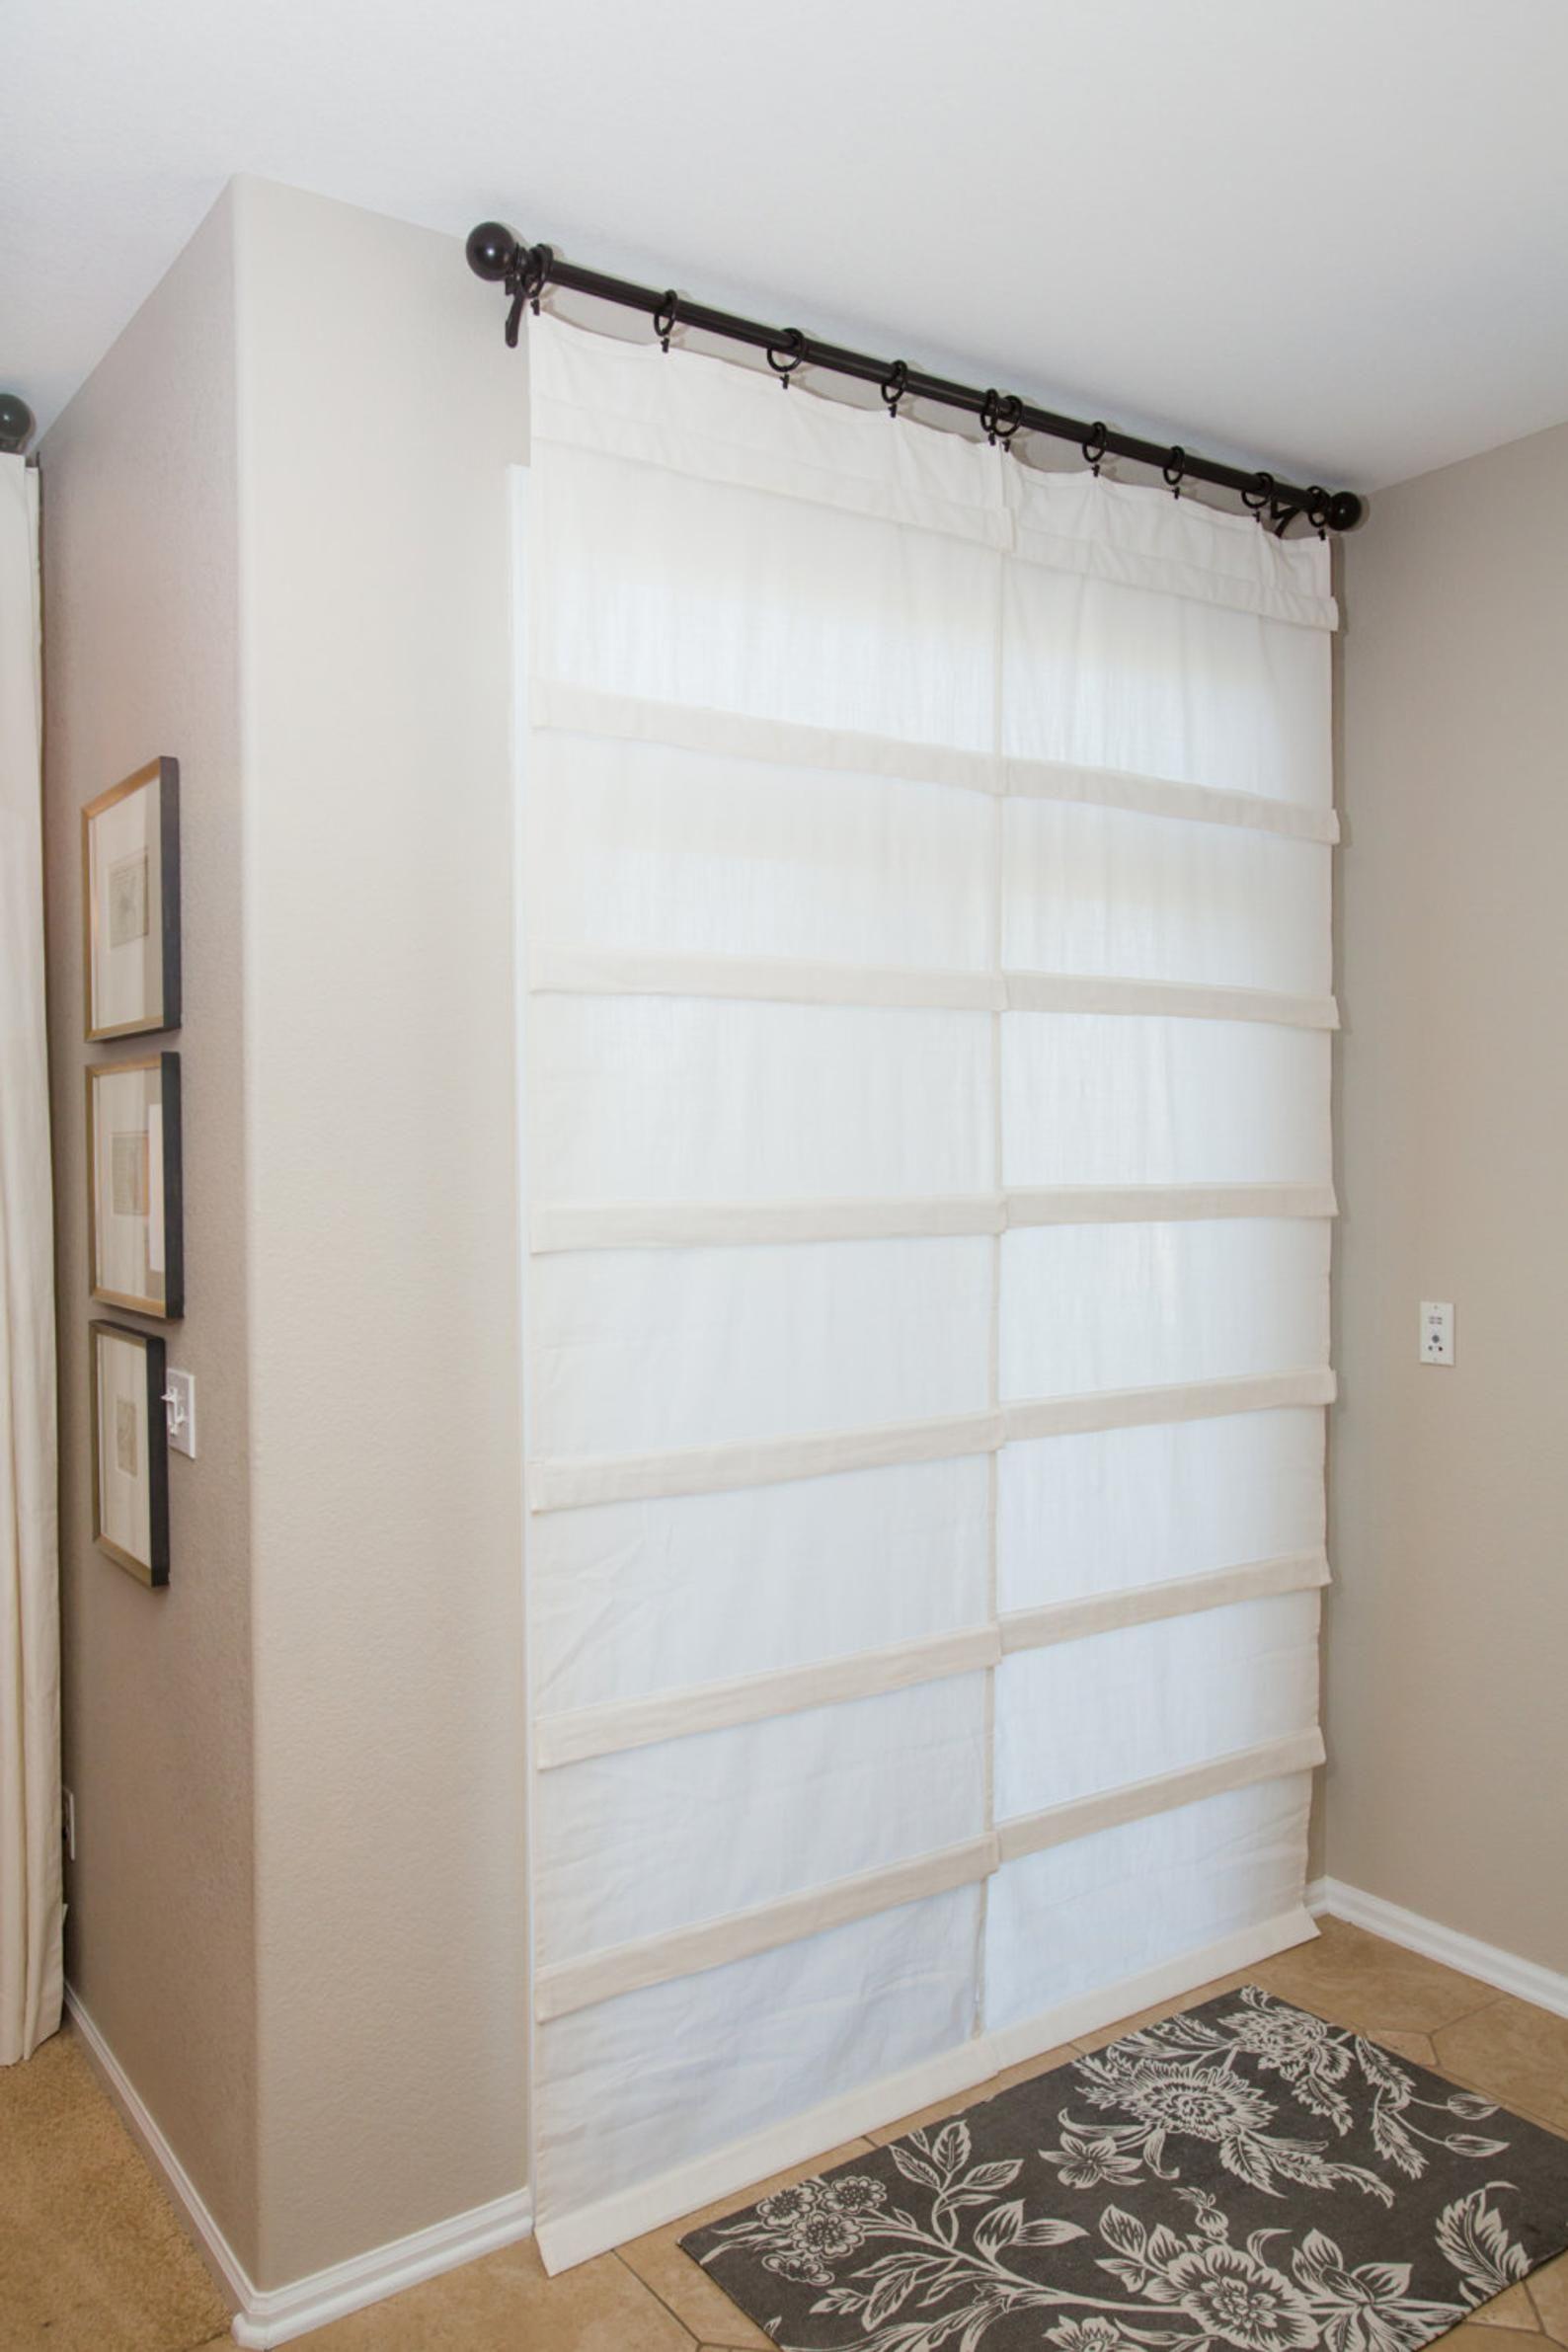 Off White Sliding Glass Door Curtain Shade Pricing Is For 1 Etsy In 2020 Sliding Glass Door Curtains Glass Door Curtains Sliding Glass Door